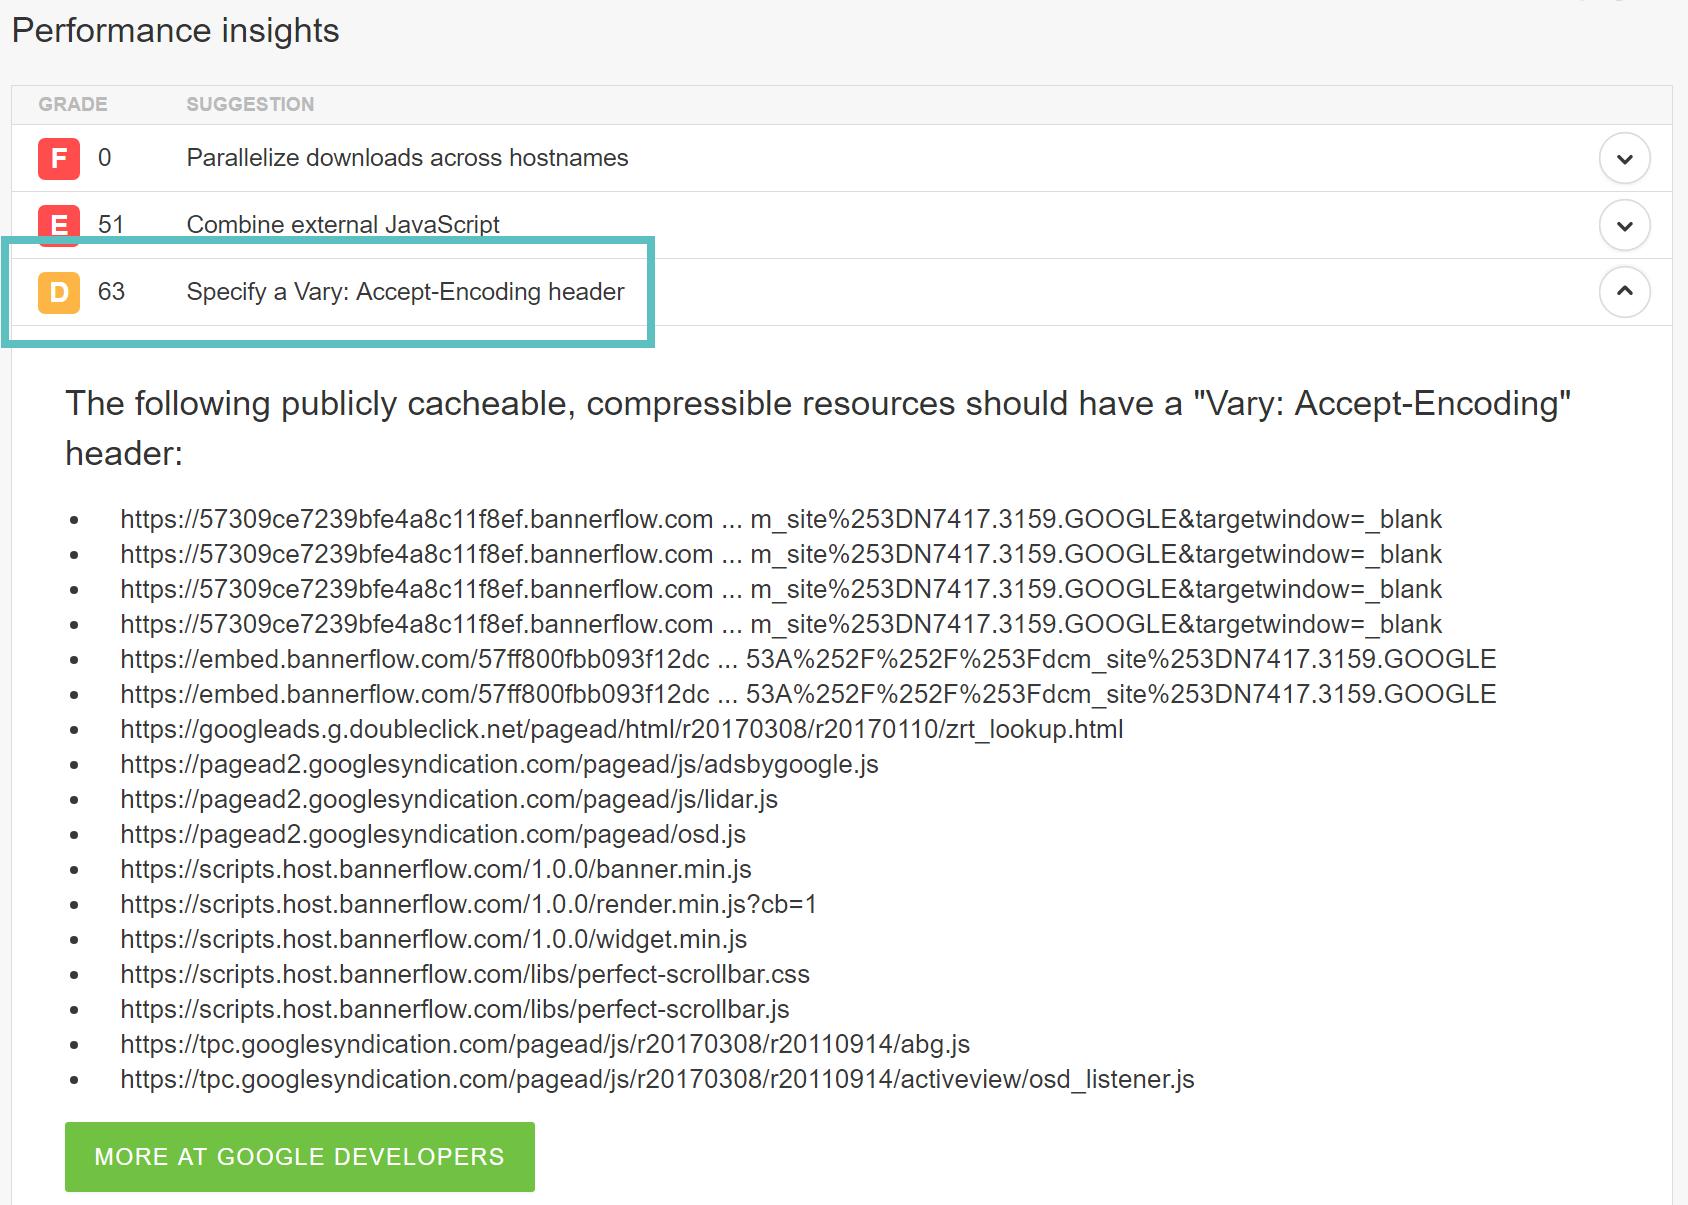 هشدار Specify a Vary: Accept-Encoding header